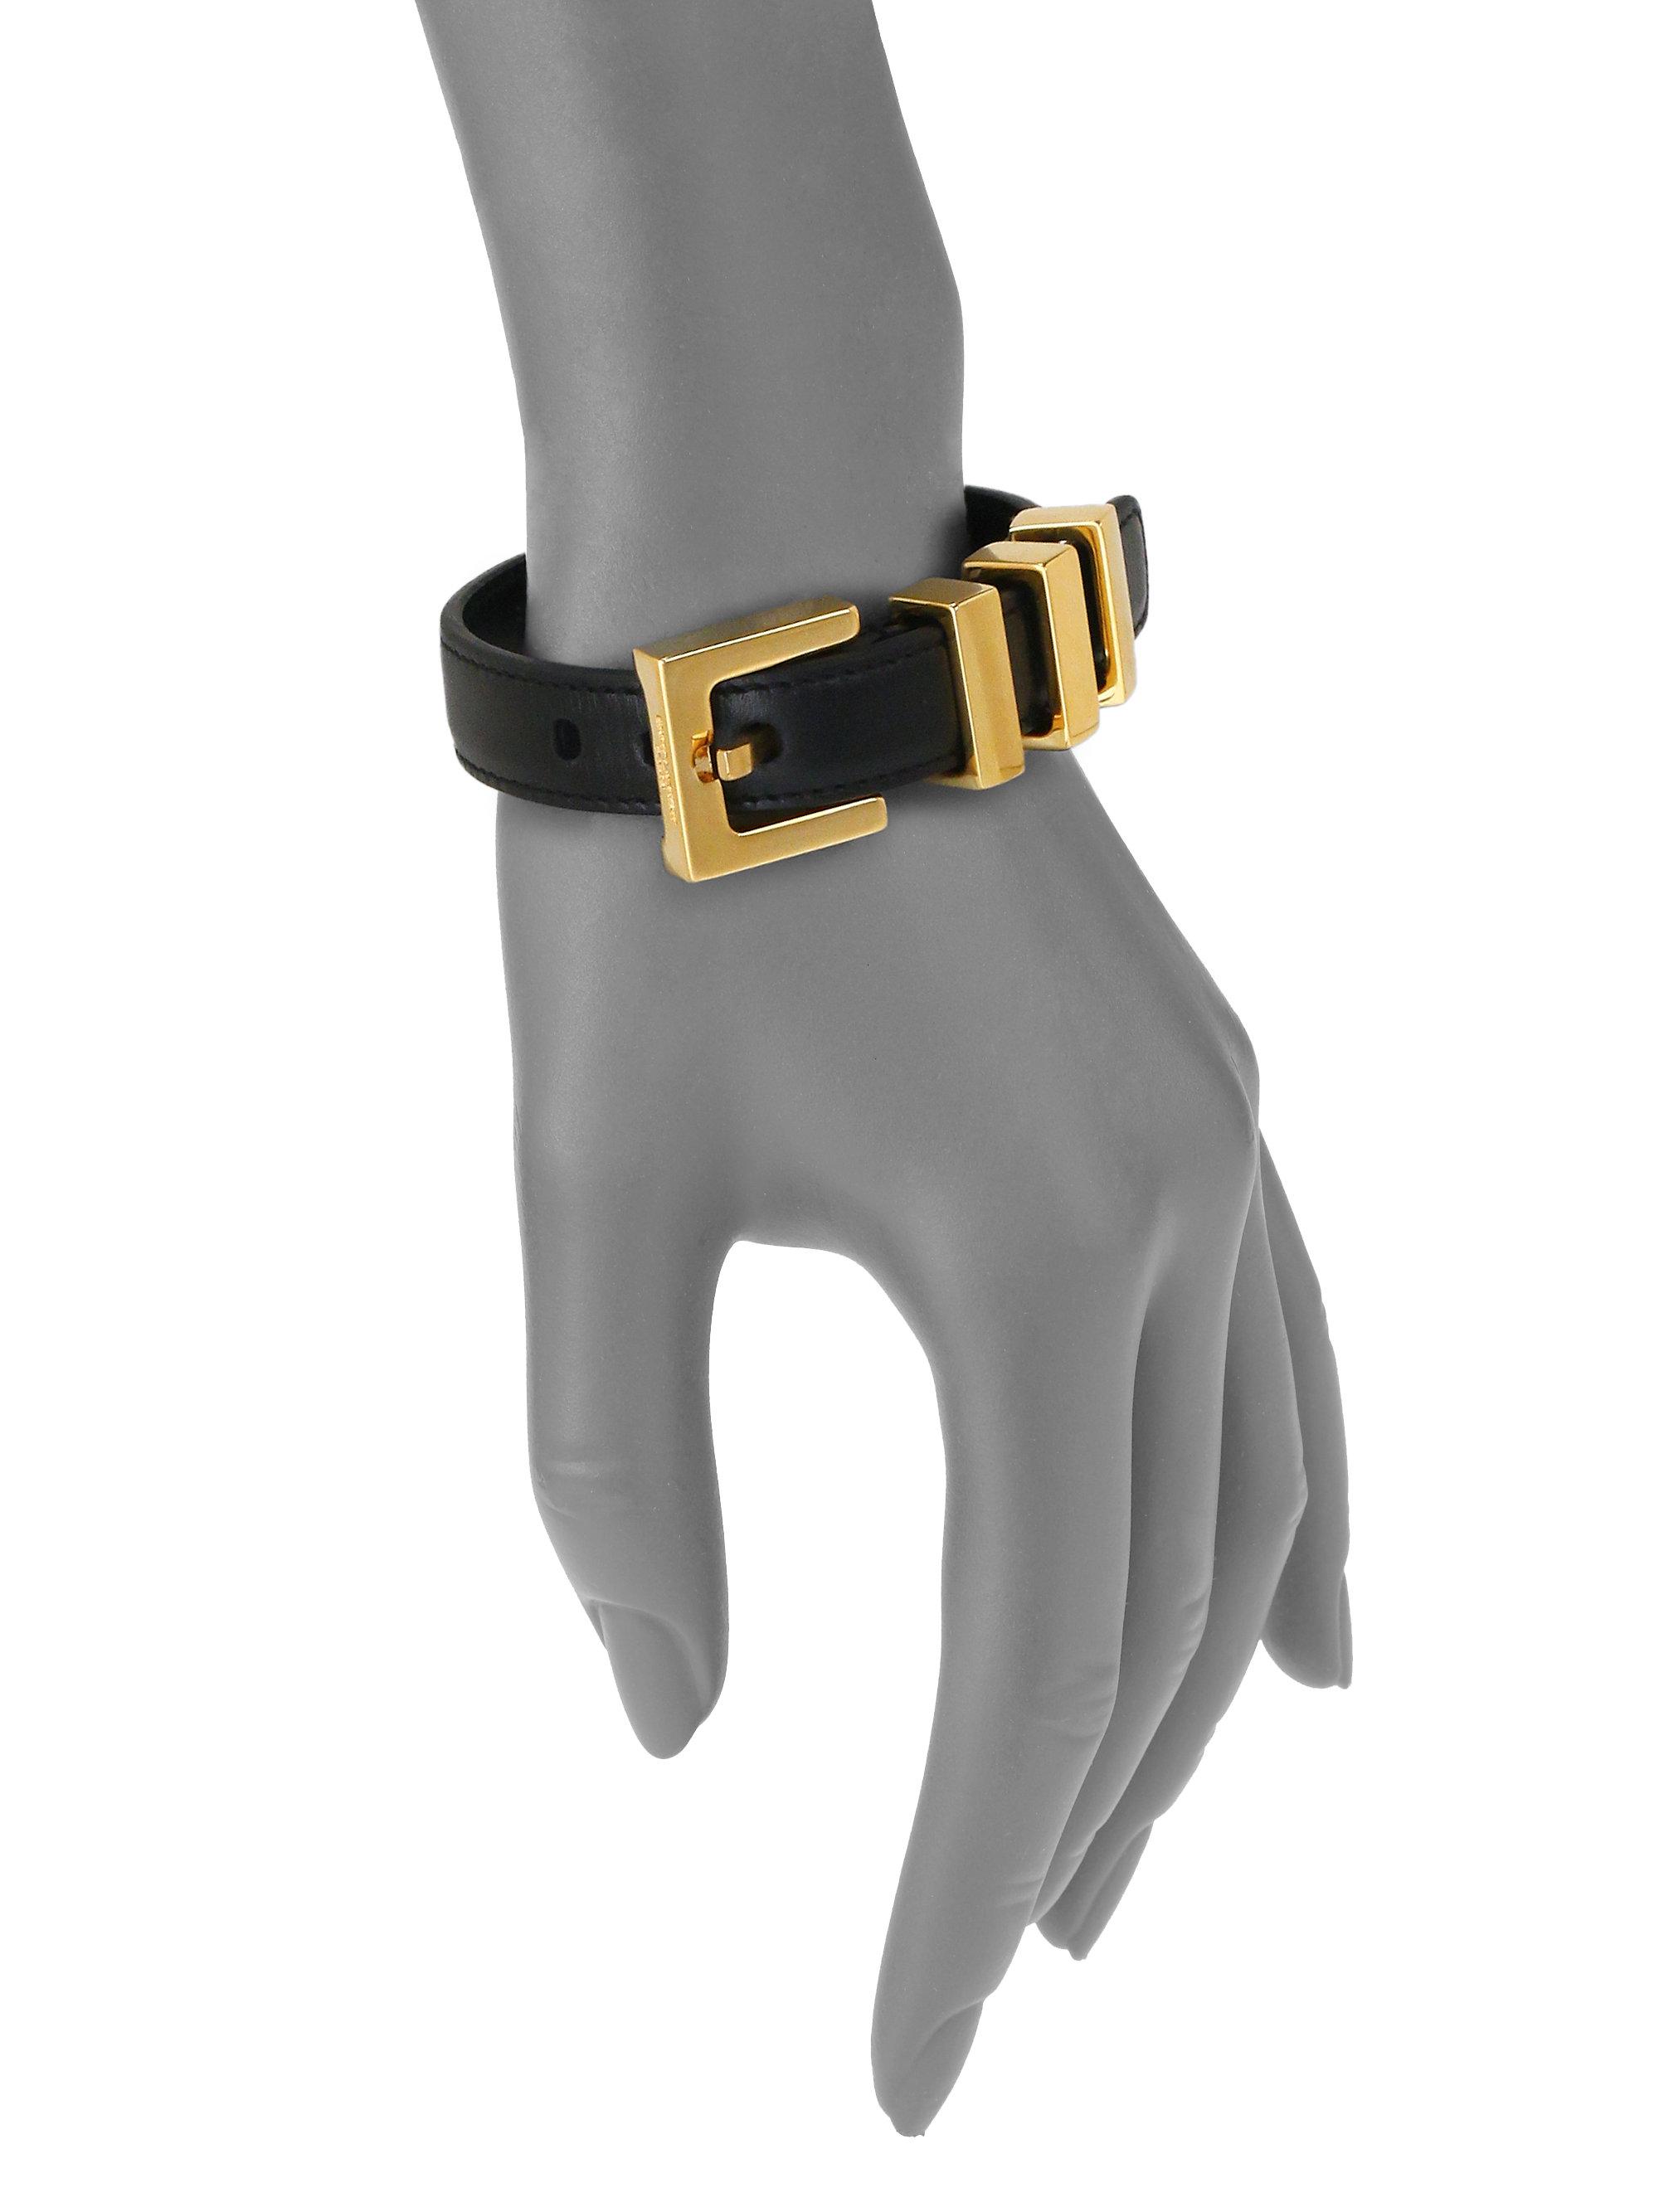 93756137ea6 Saint Laurent Leather Buckle Bracelet in Black - Lyst